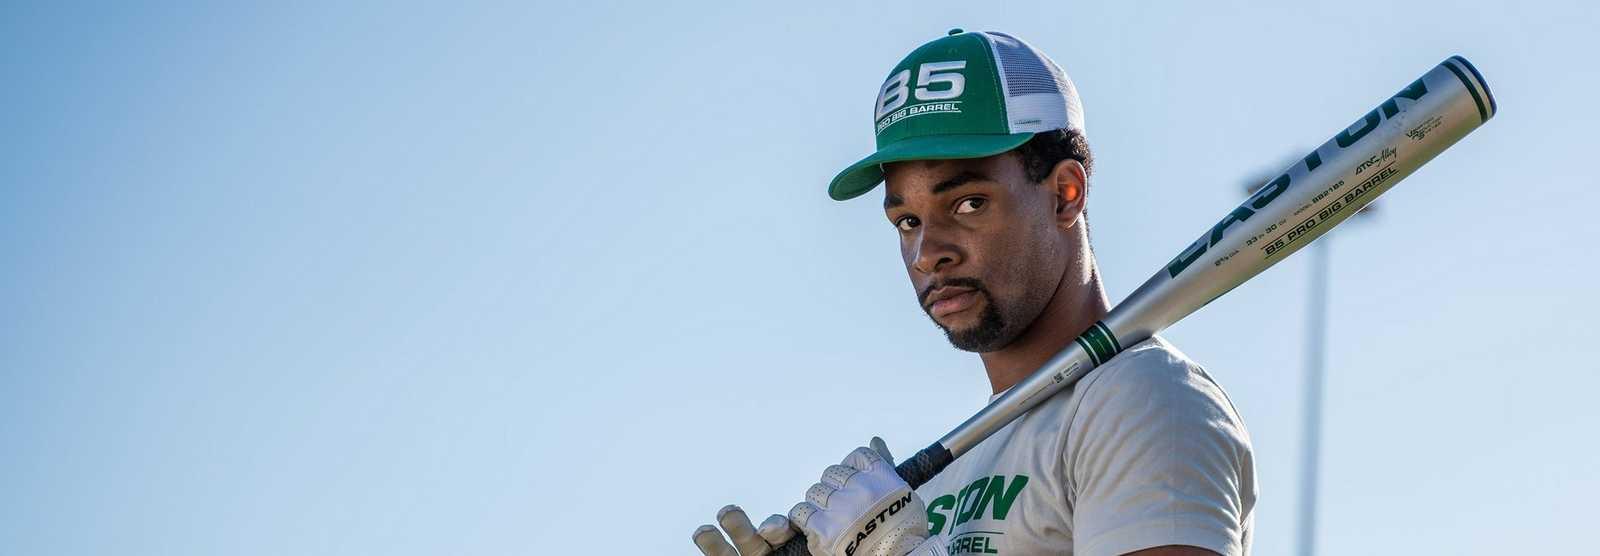 baseball-b5-hat